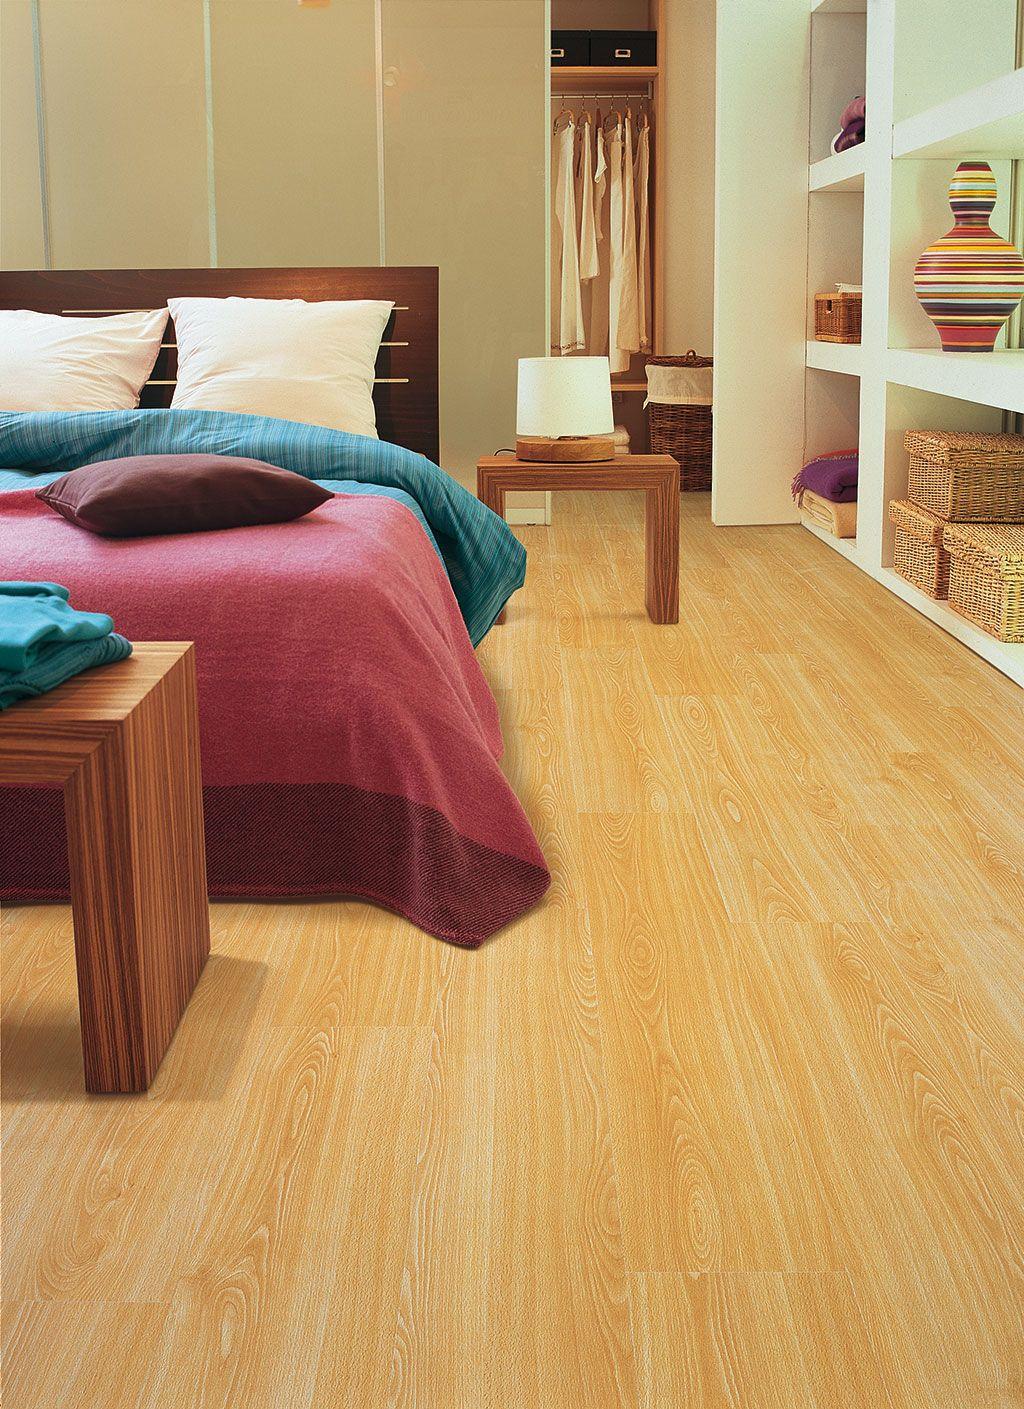 QuickStep Classic Natural beech, planks (QST009) Laminte